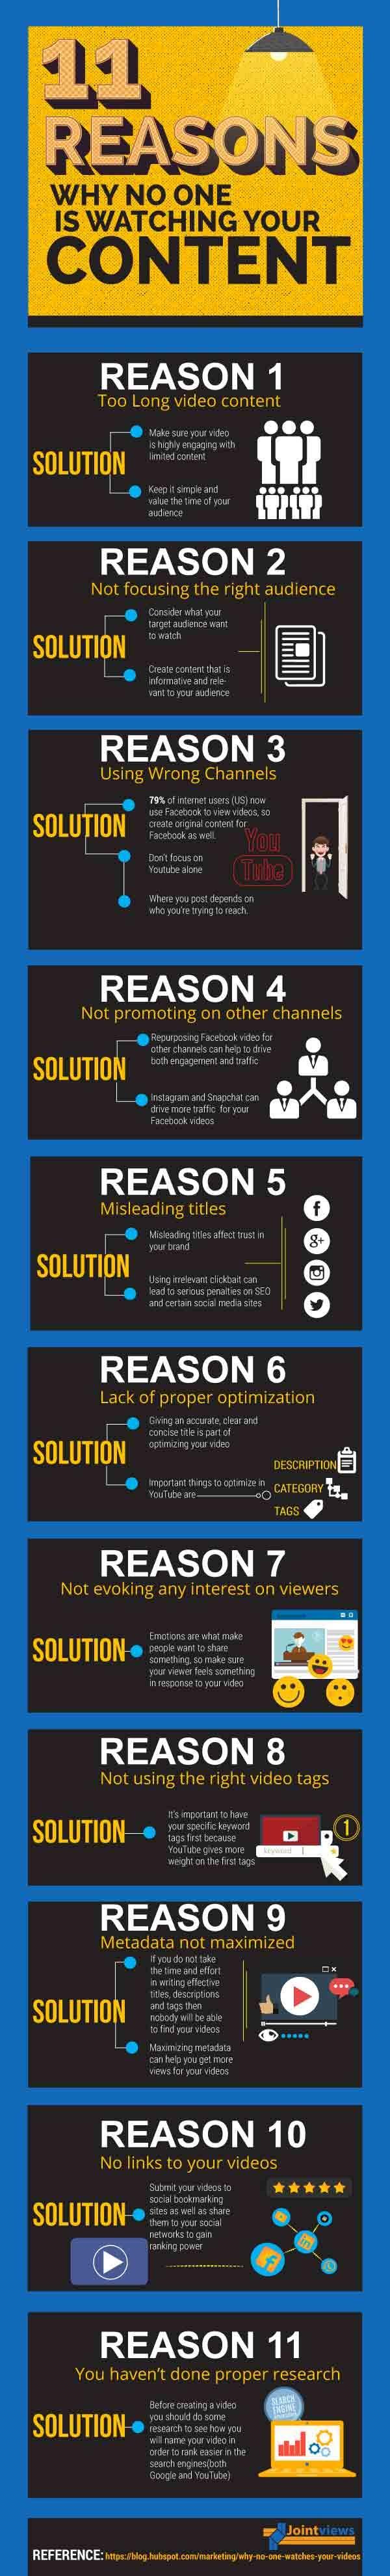 11_reasons_why_no_one_info.jpg